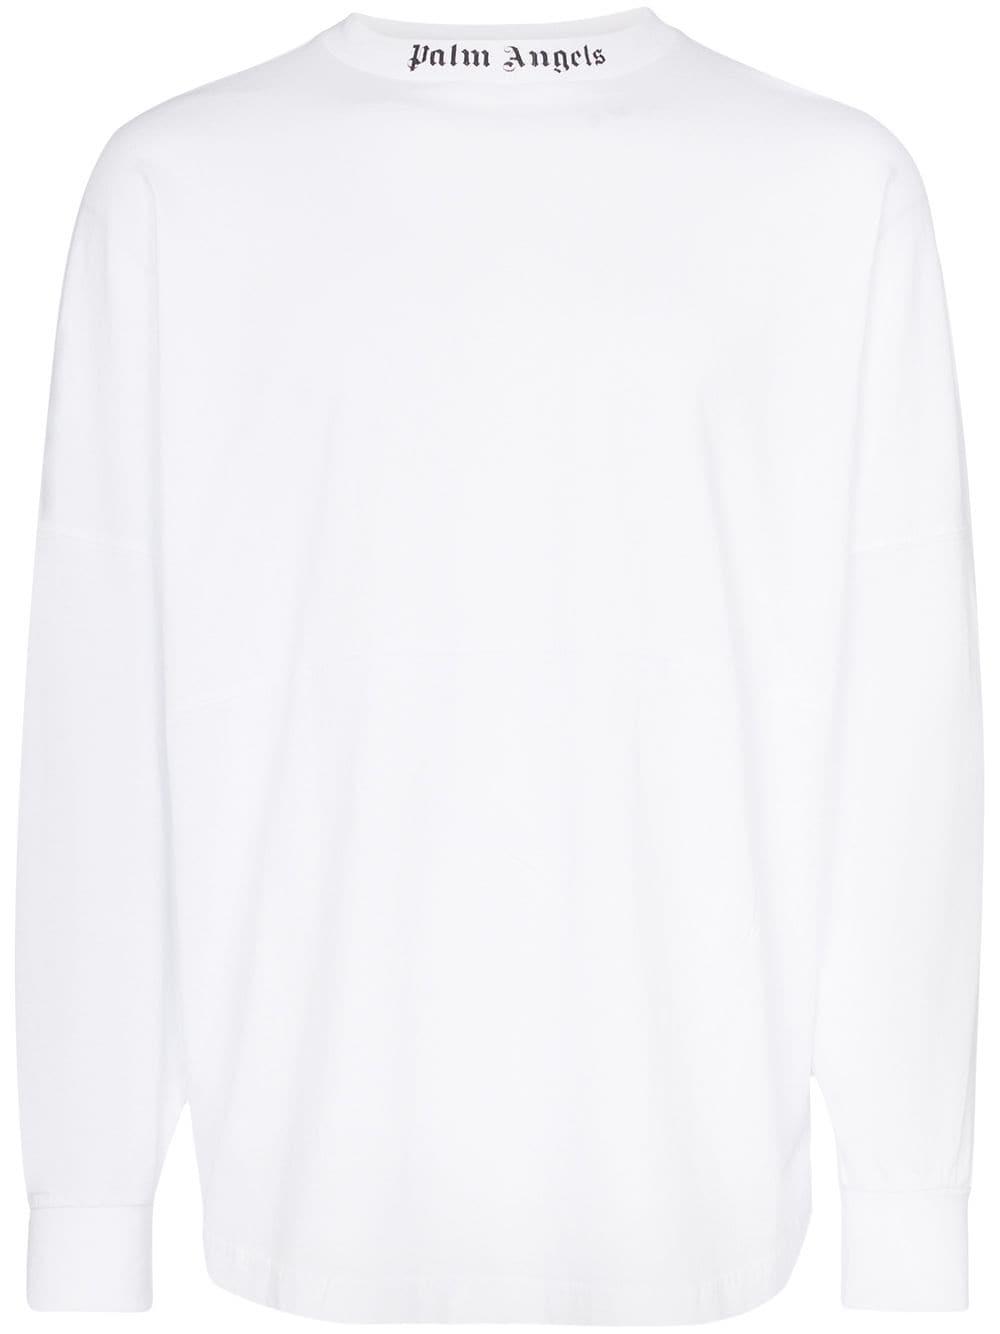 Pin By Modesens Men On Dibujos Para Remeras In 2021 Angels Logo Print T Shirt Palm Angels [ 1334 x 1000 Pixel ]